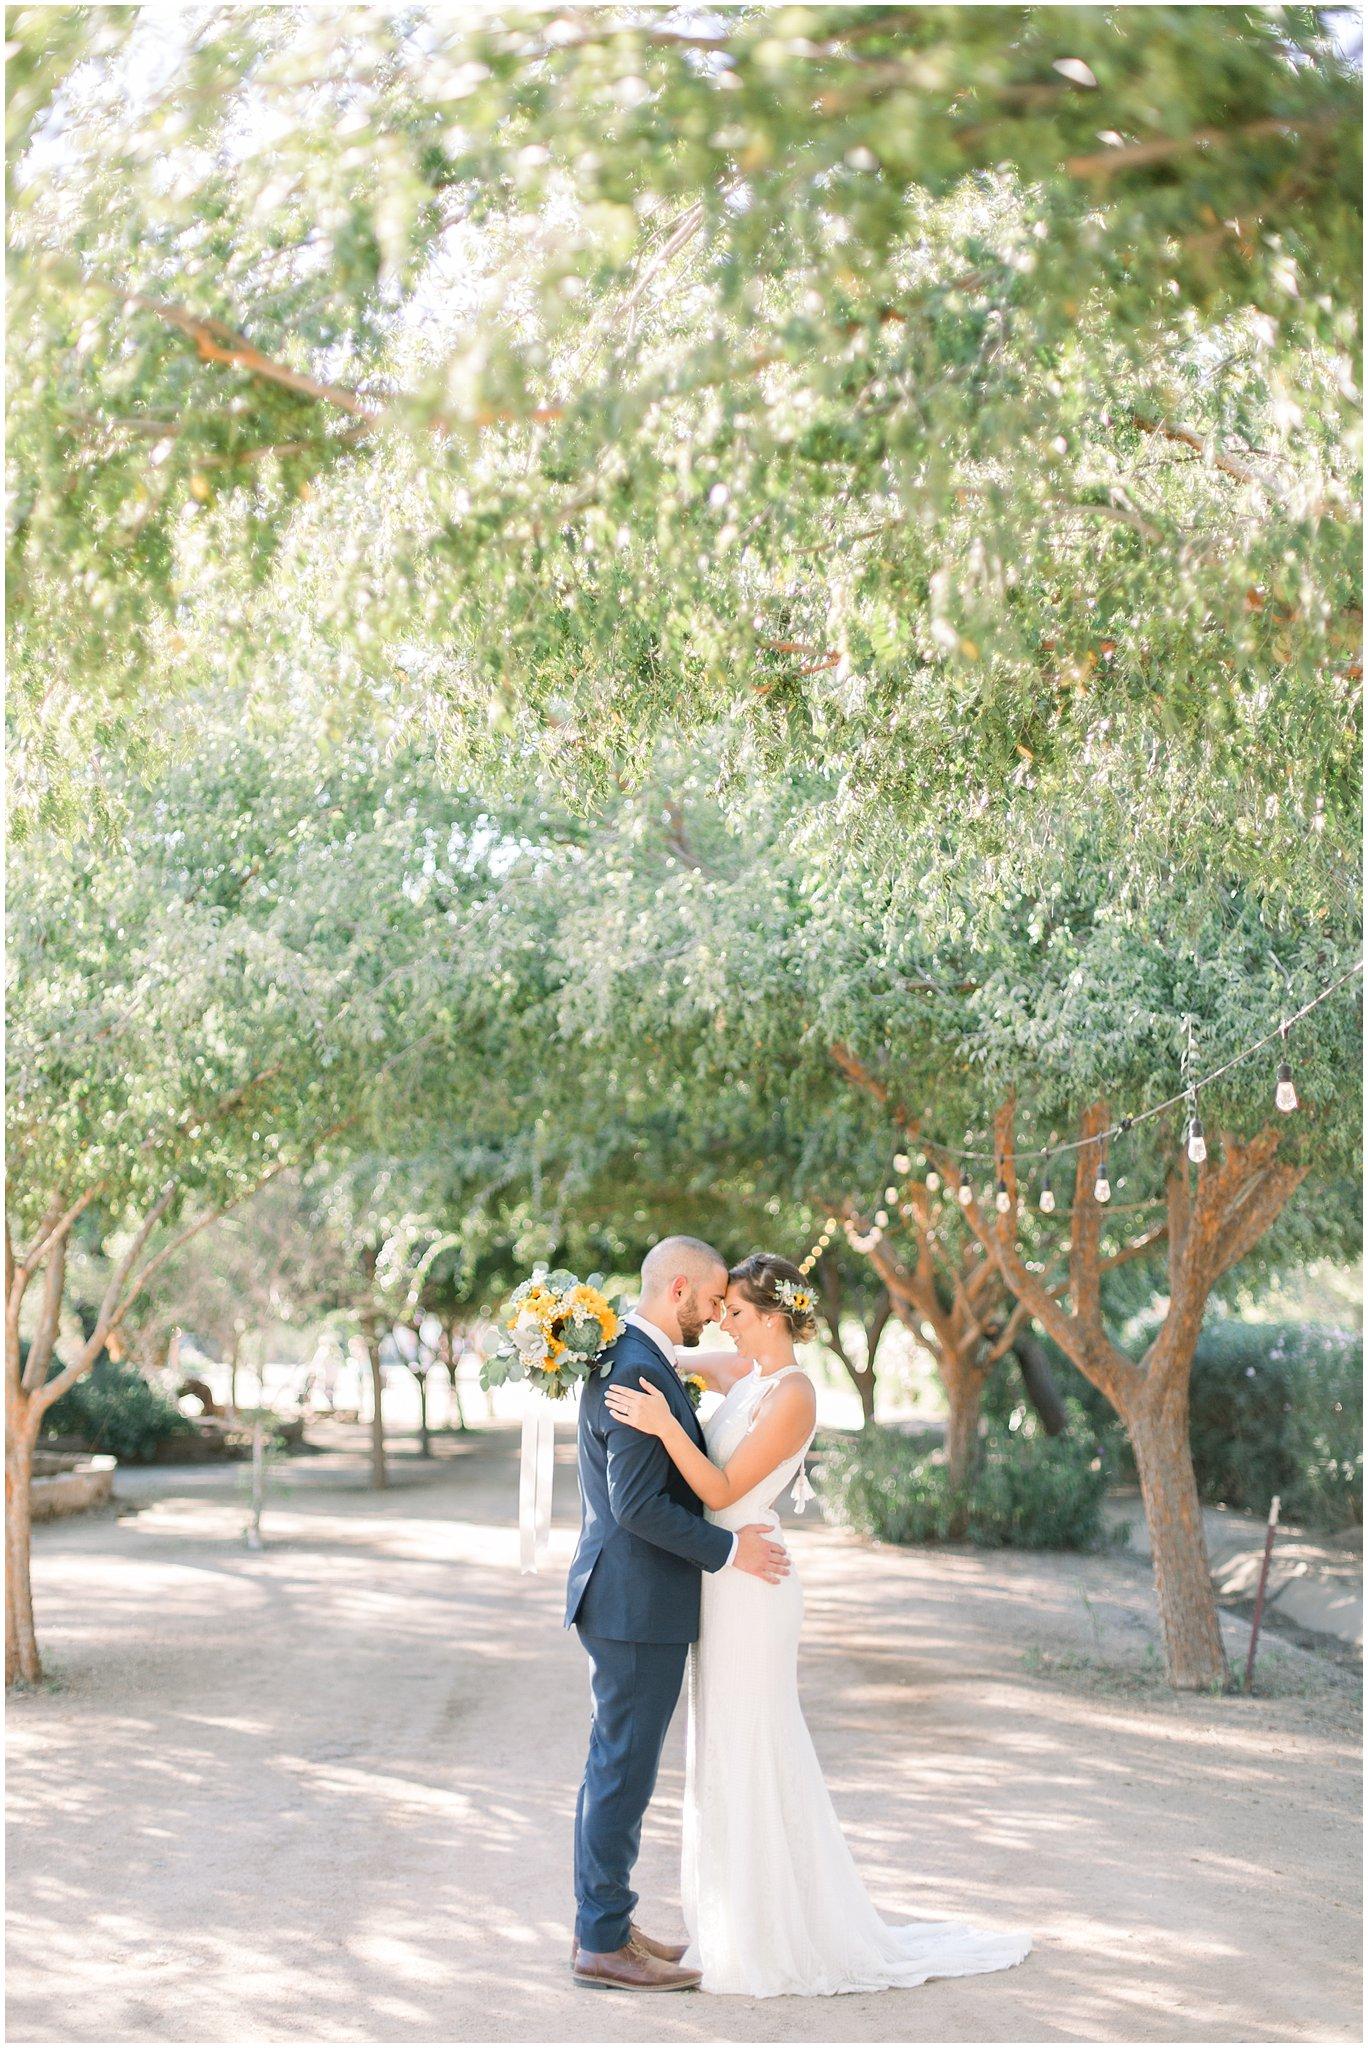 Hyatt-Lodge-Mcdonald-Campus-Wedding_0099.jpg